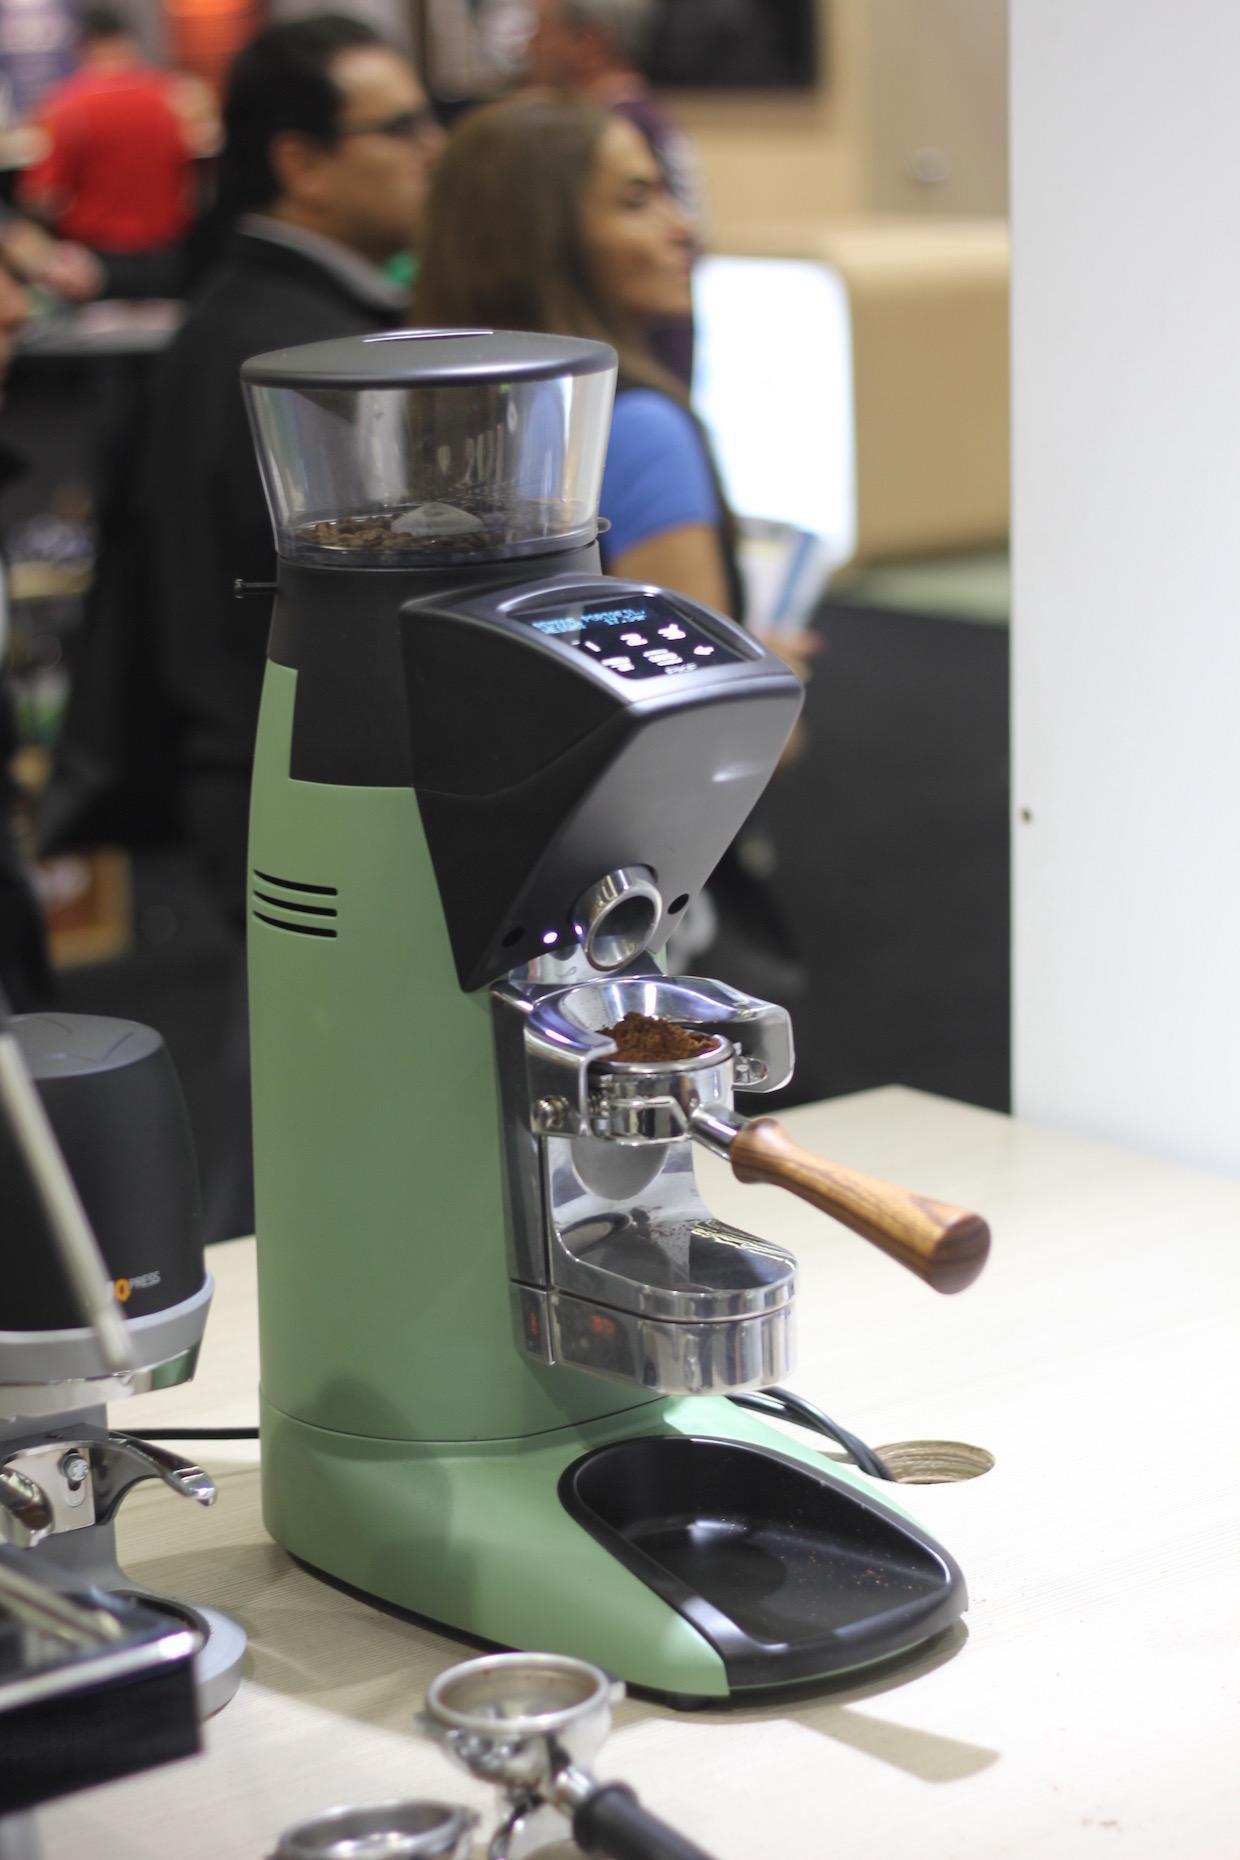 The Compak PKF. Photo by Nick Brown/Daily Coffee News.